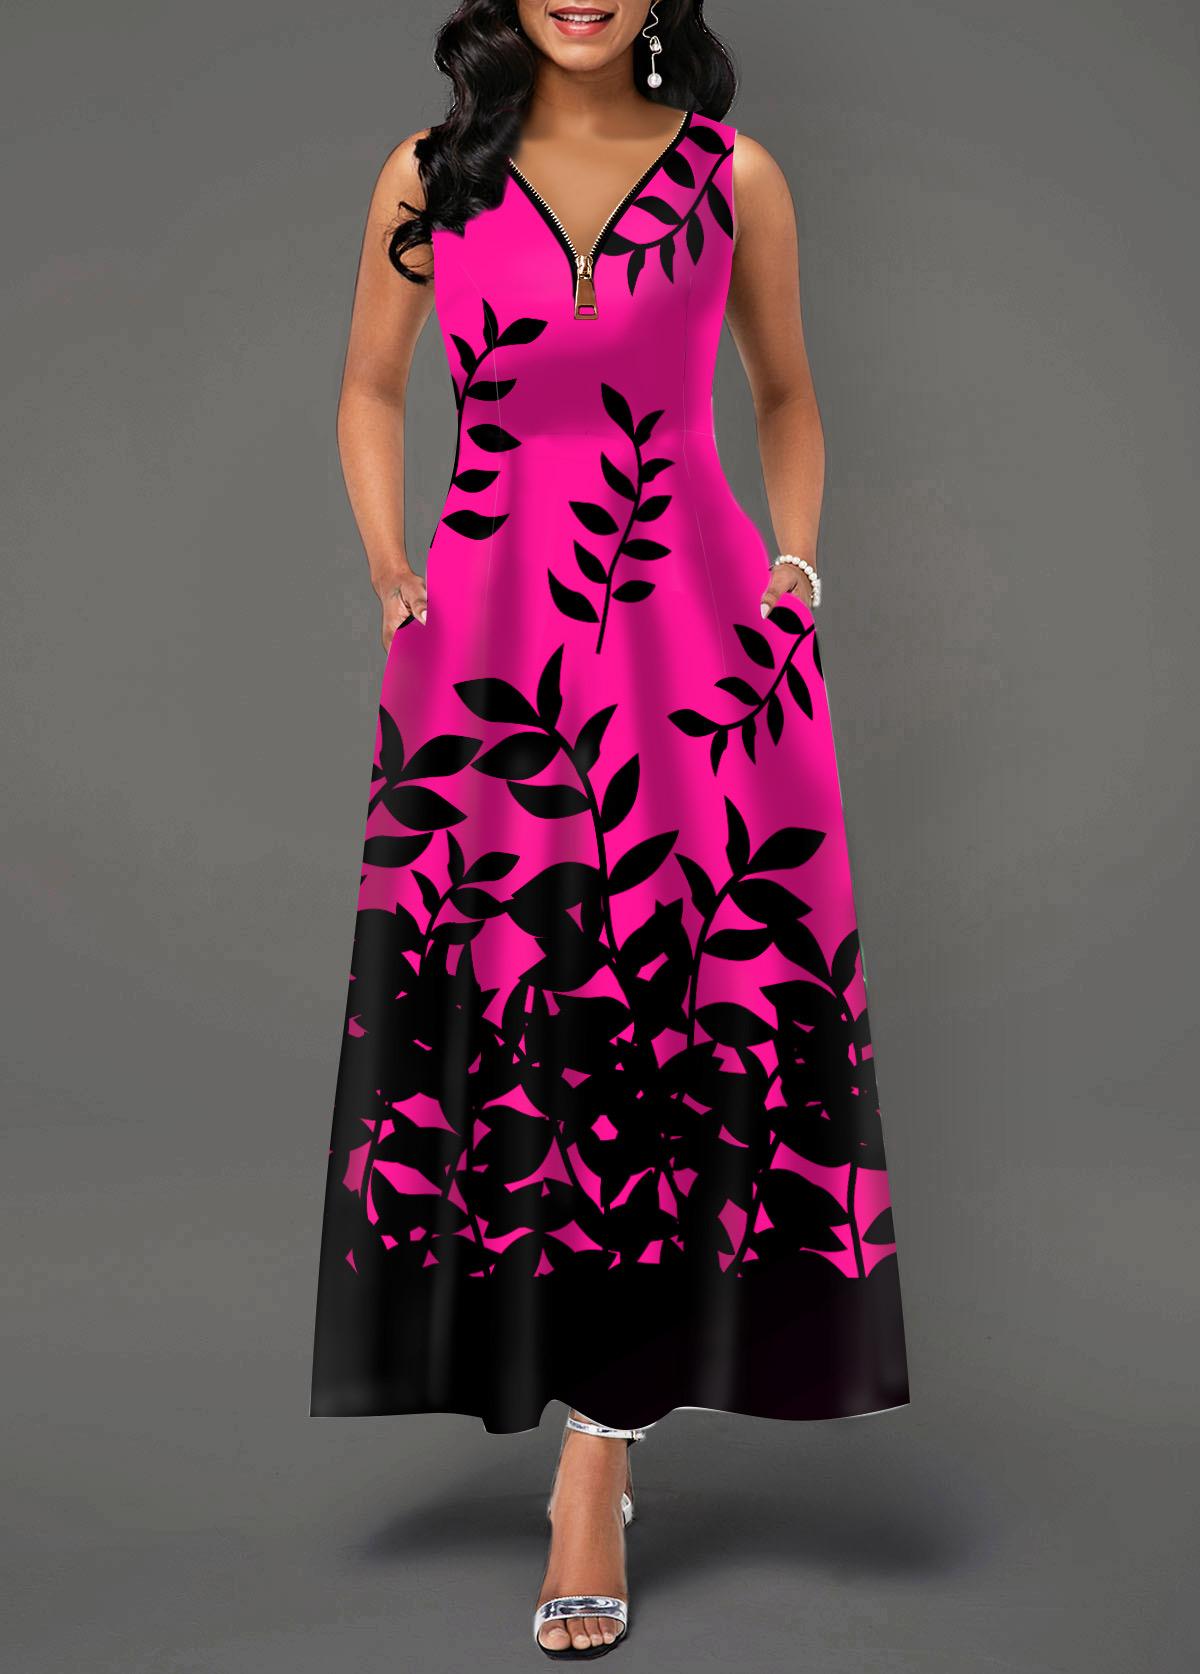 Leaf Print Zipper Detail Sleeveless Maxi Dress